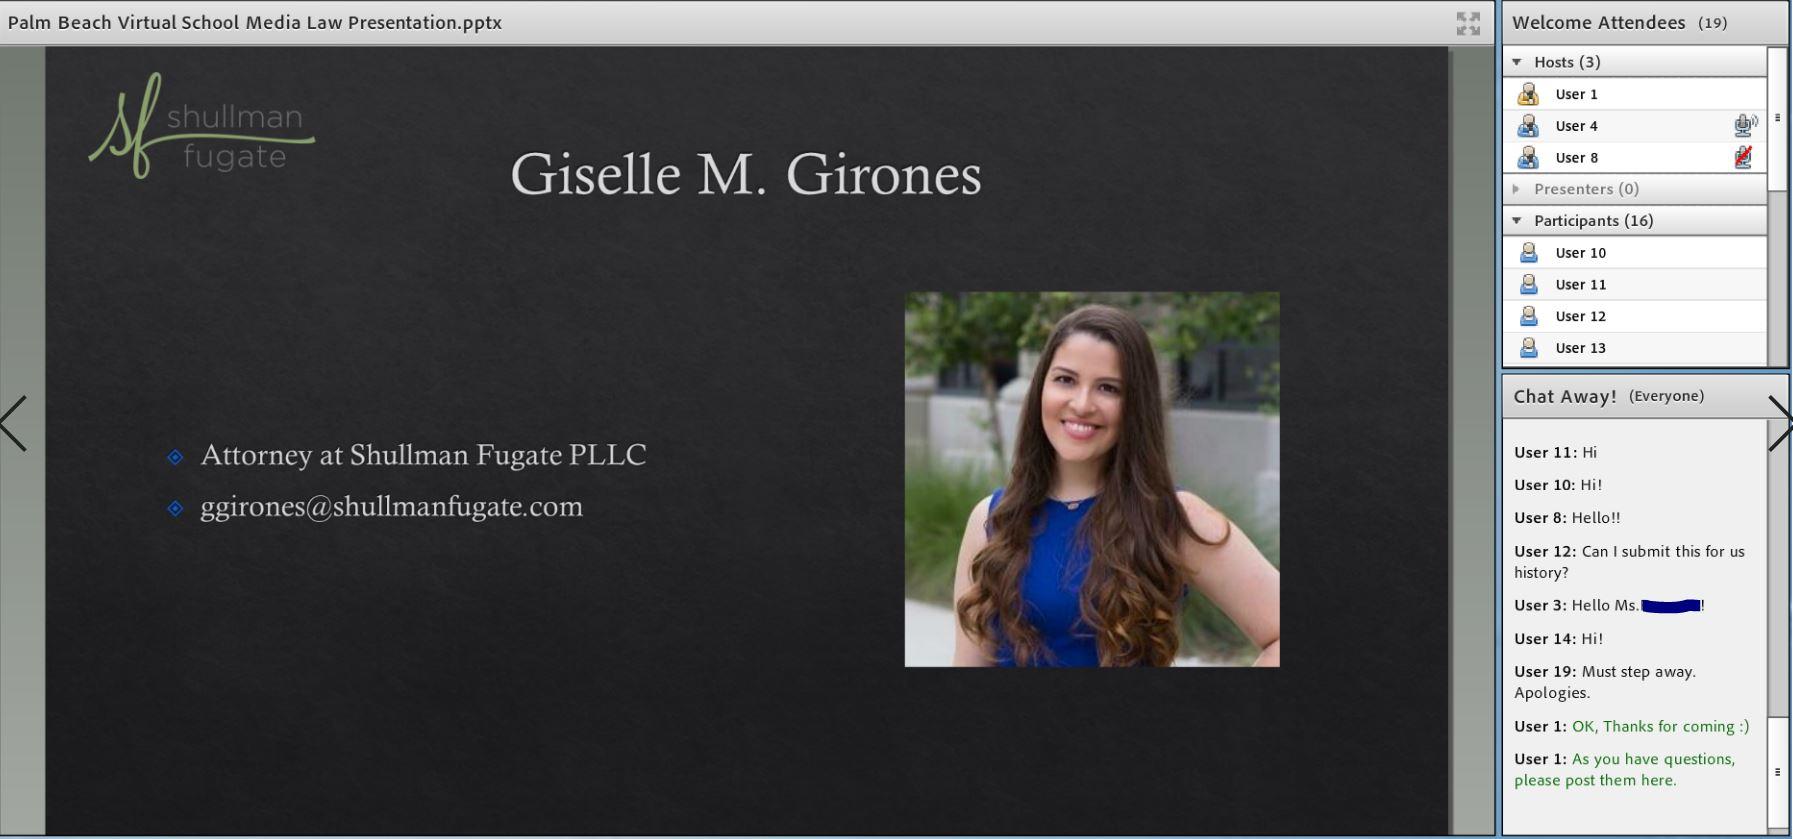 Jan. '20 - Girones' webinar